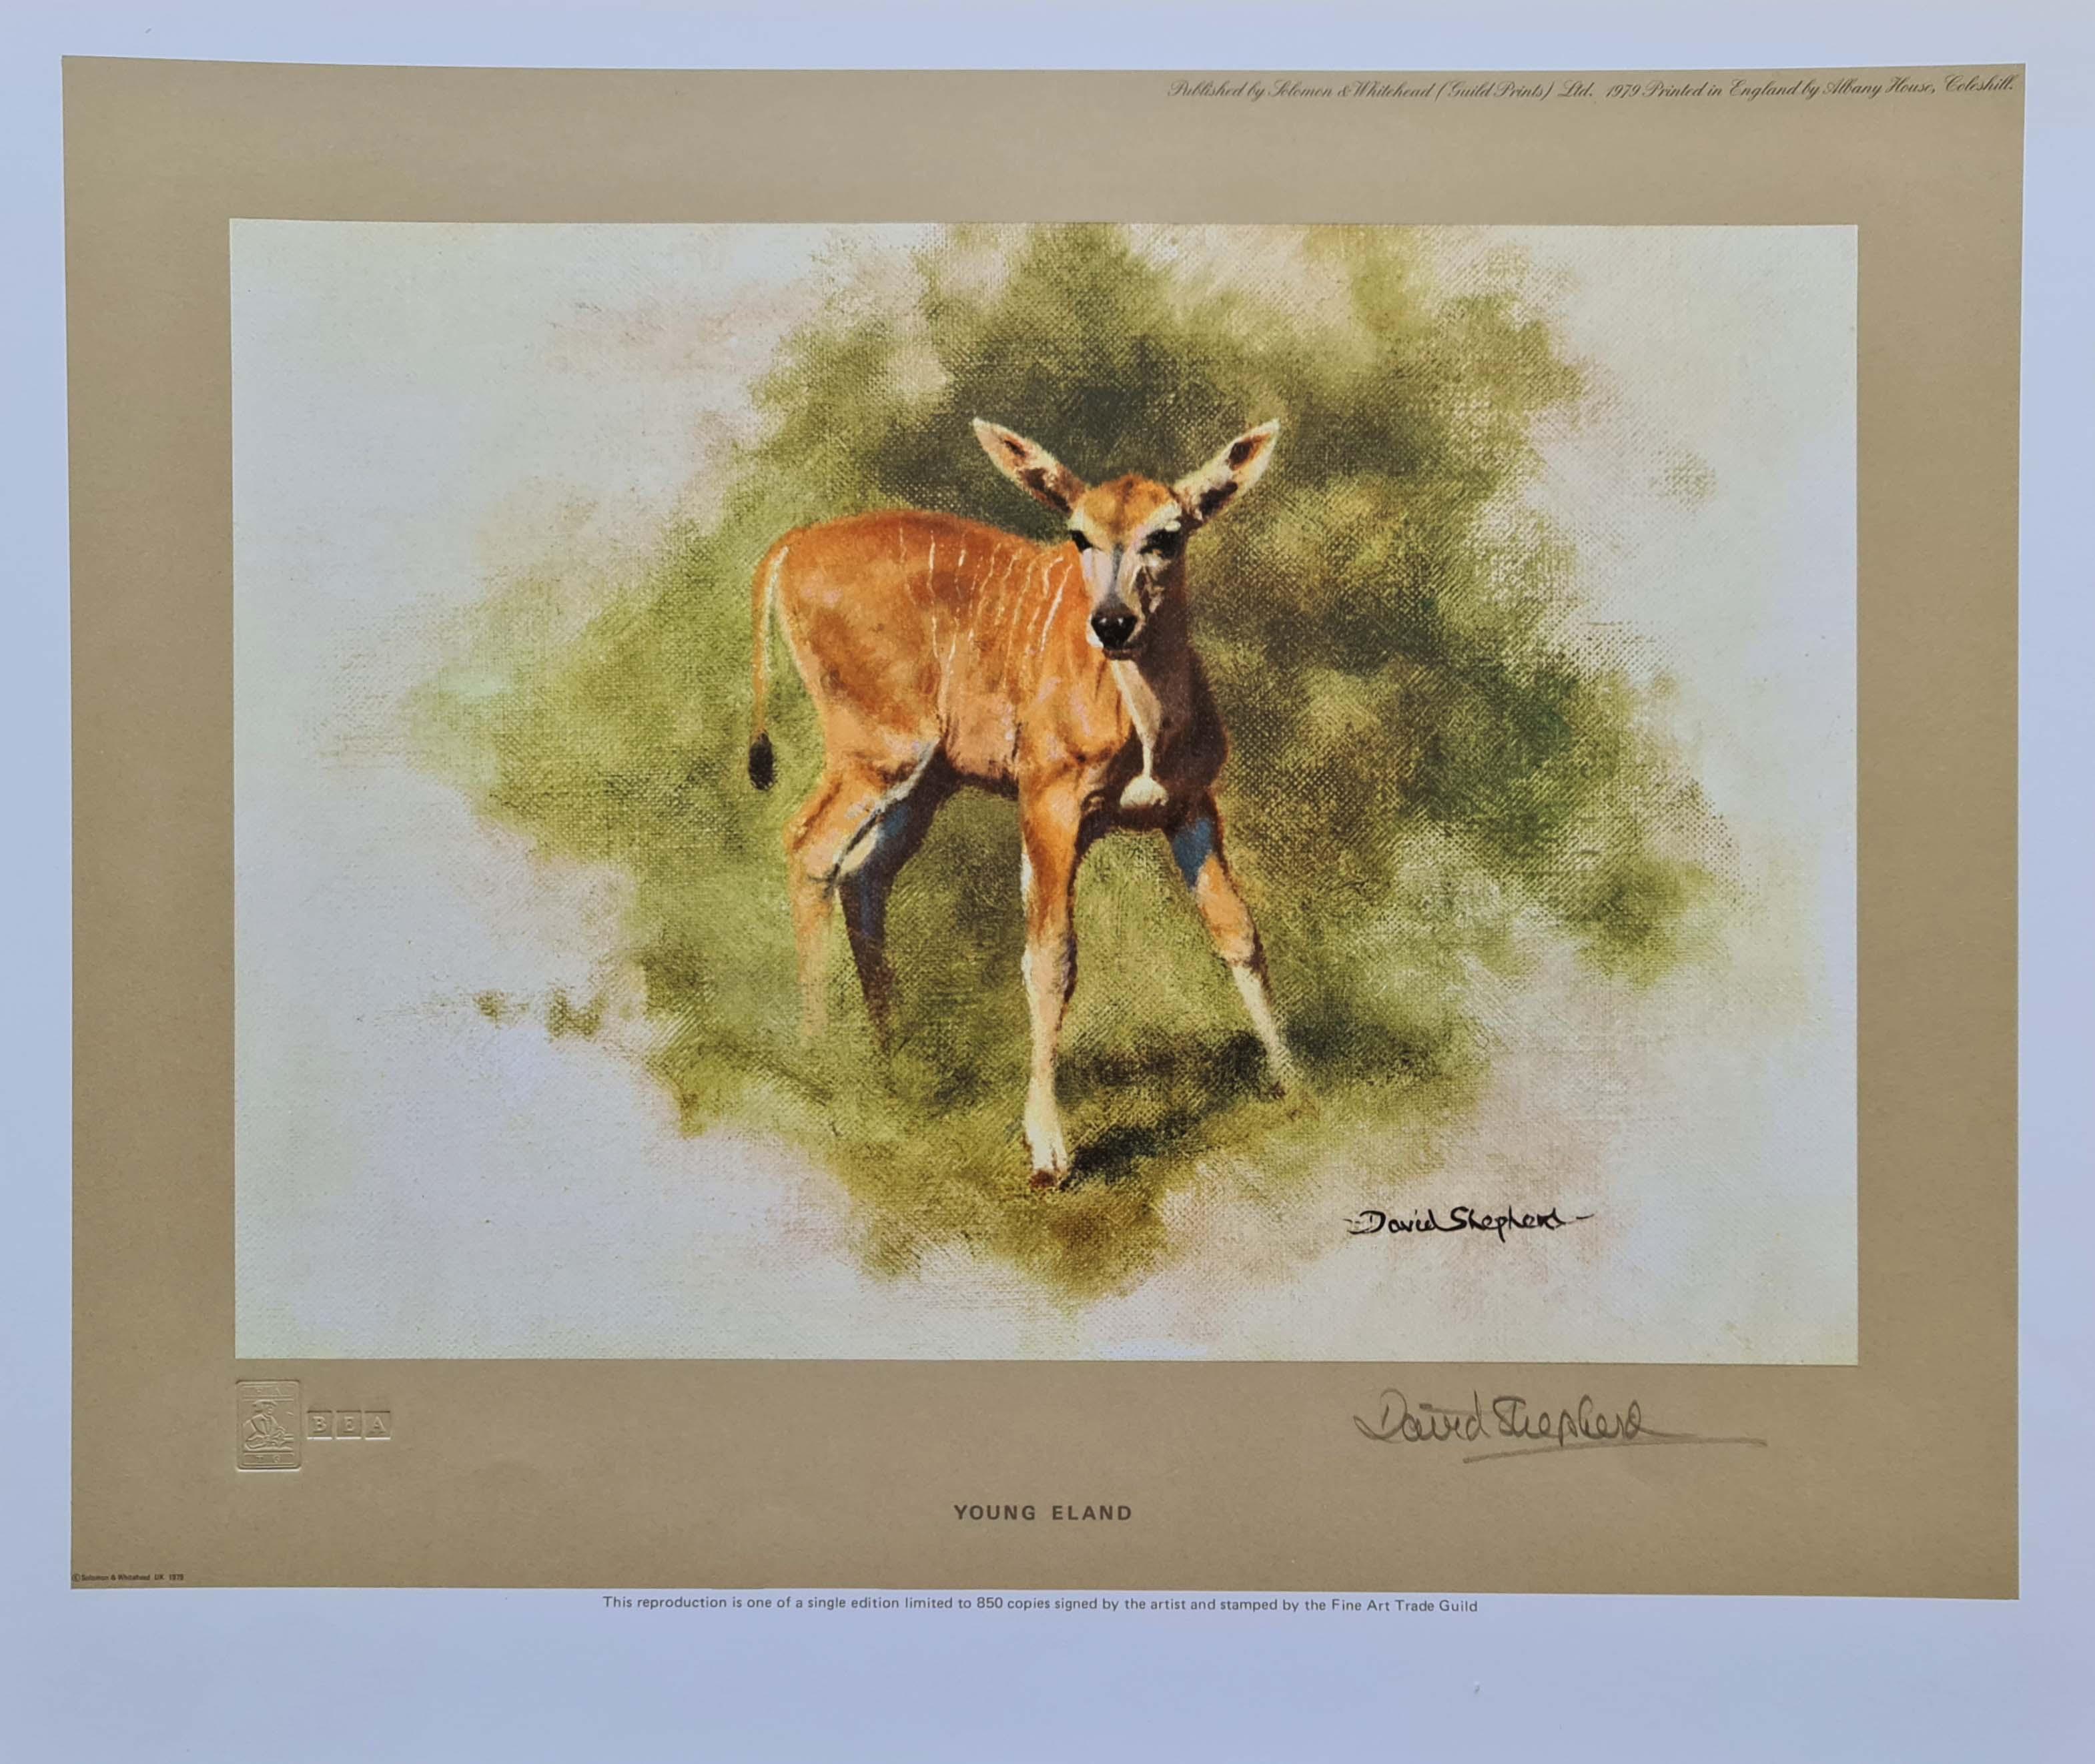 david shepherd, young eland